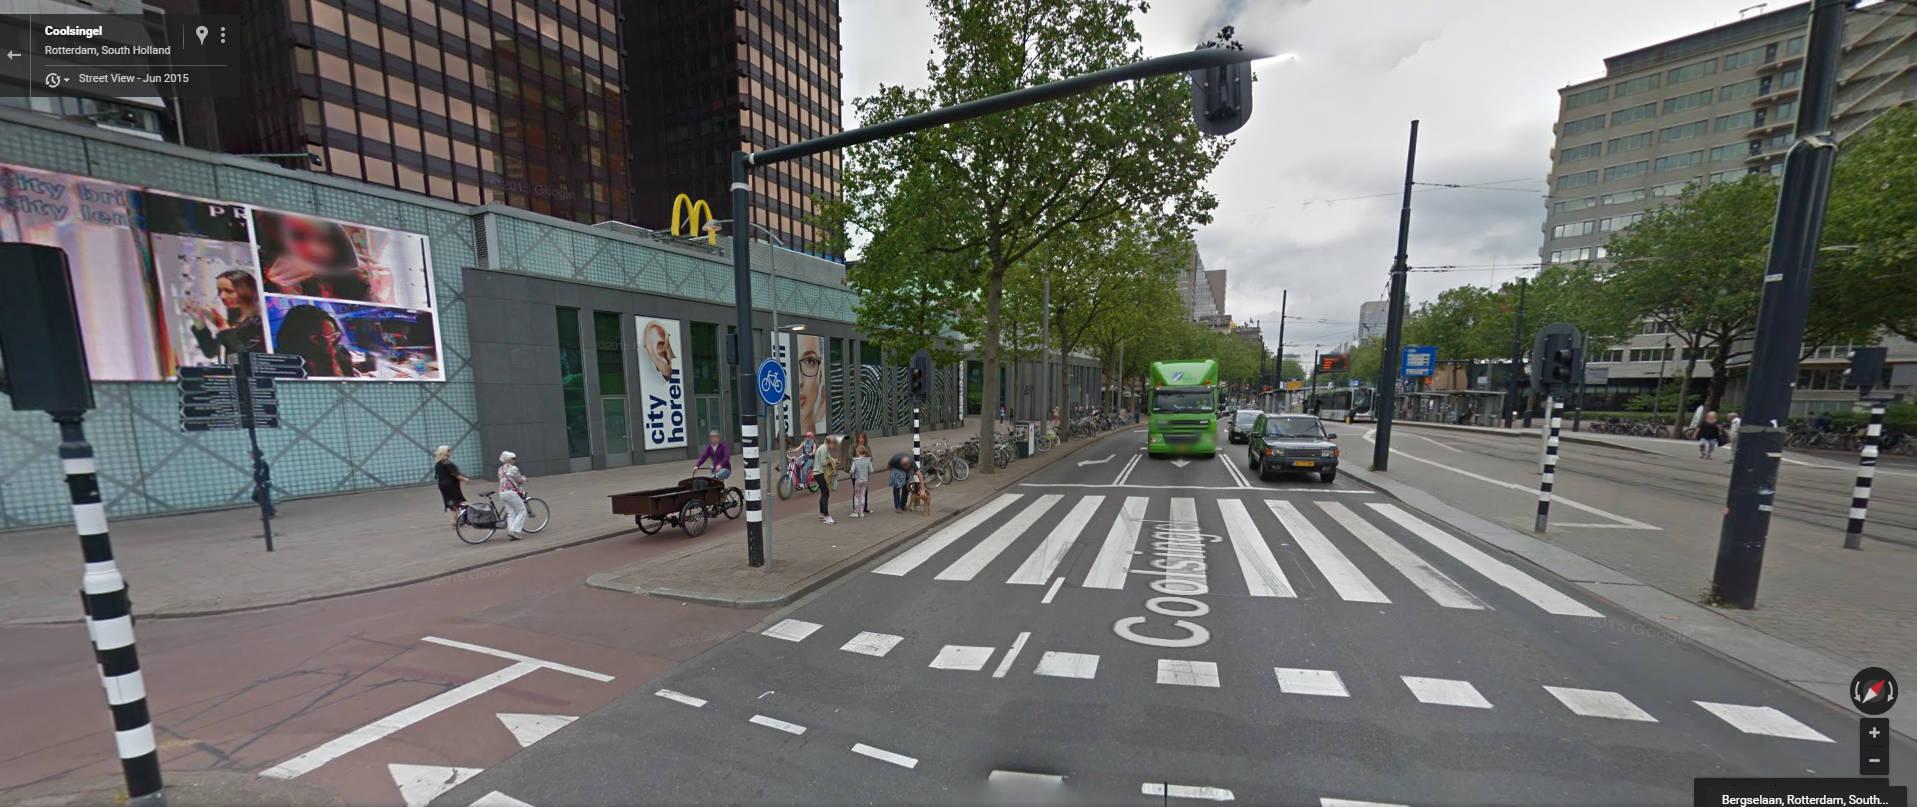 Coolsingel - Rotterdam